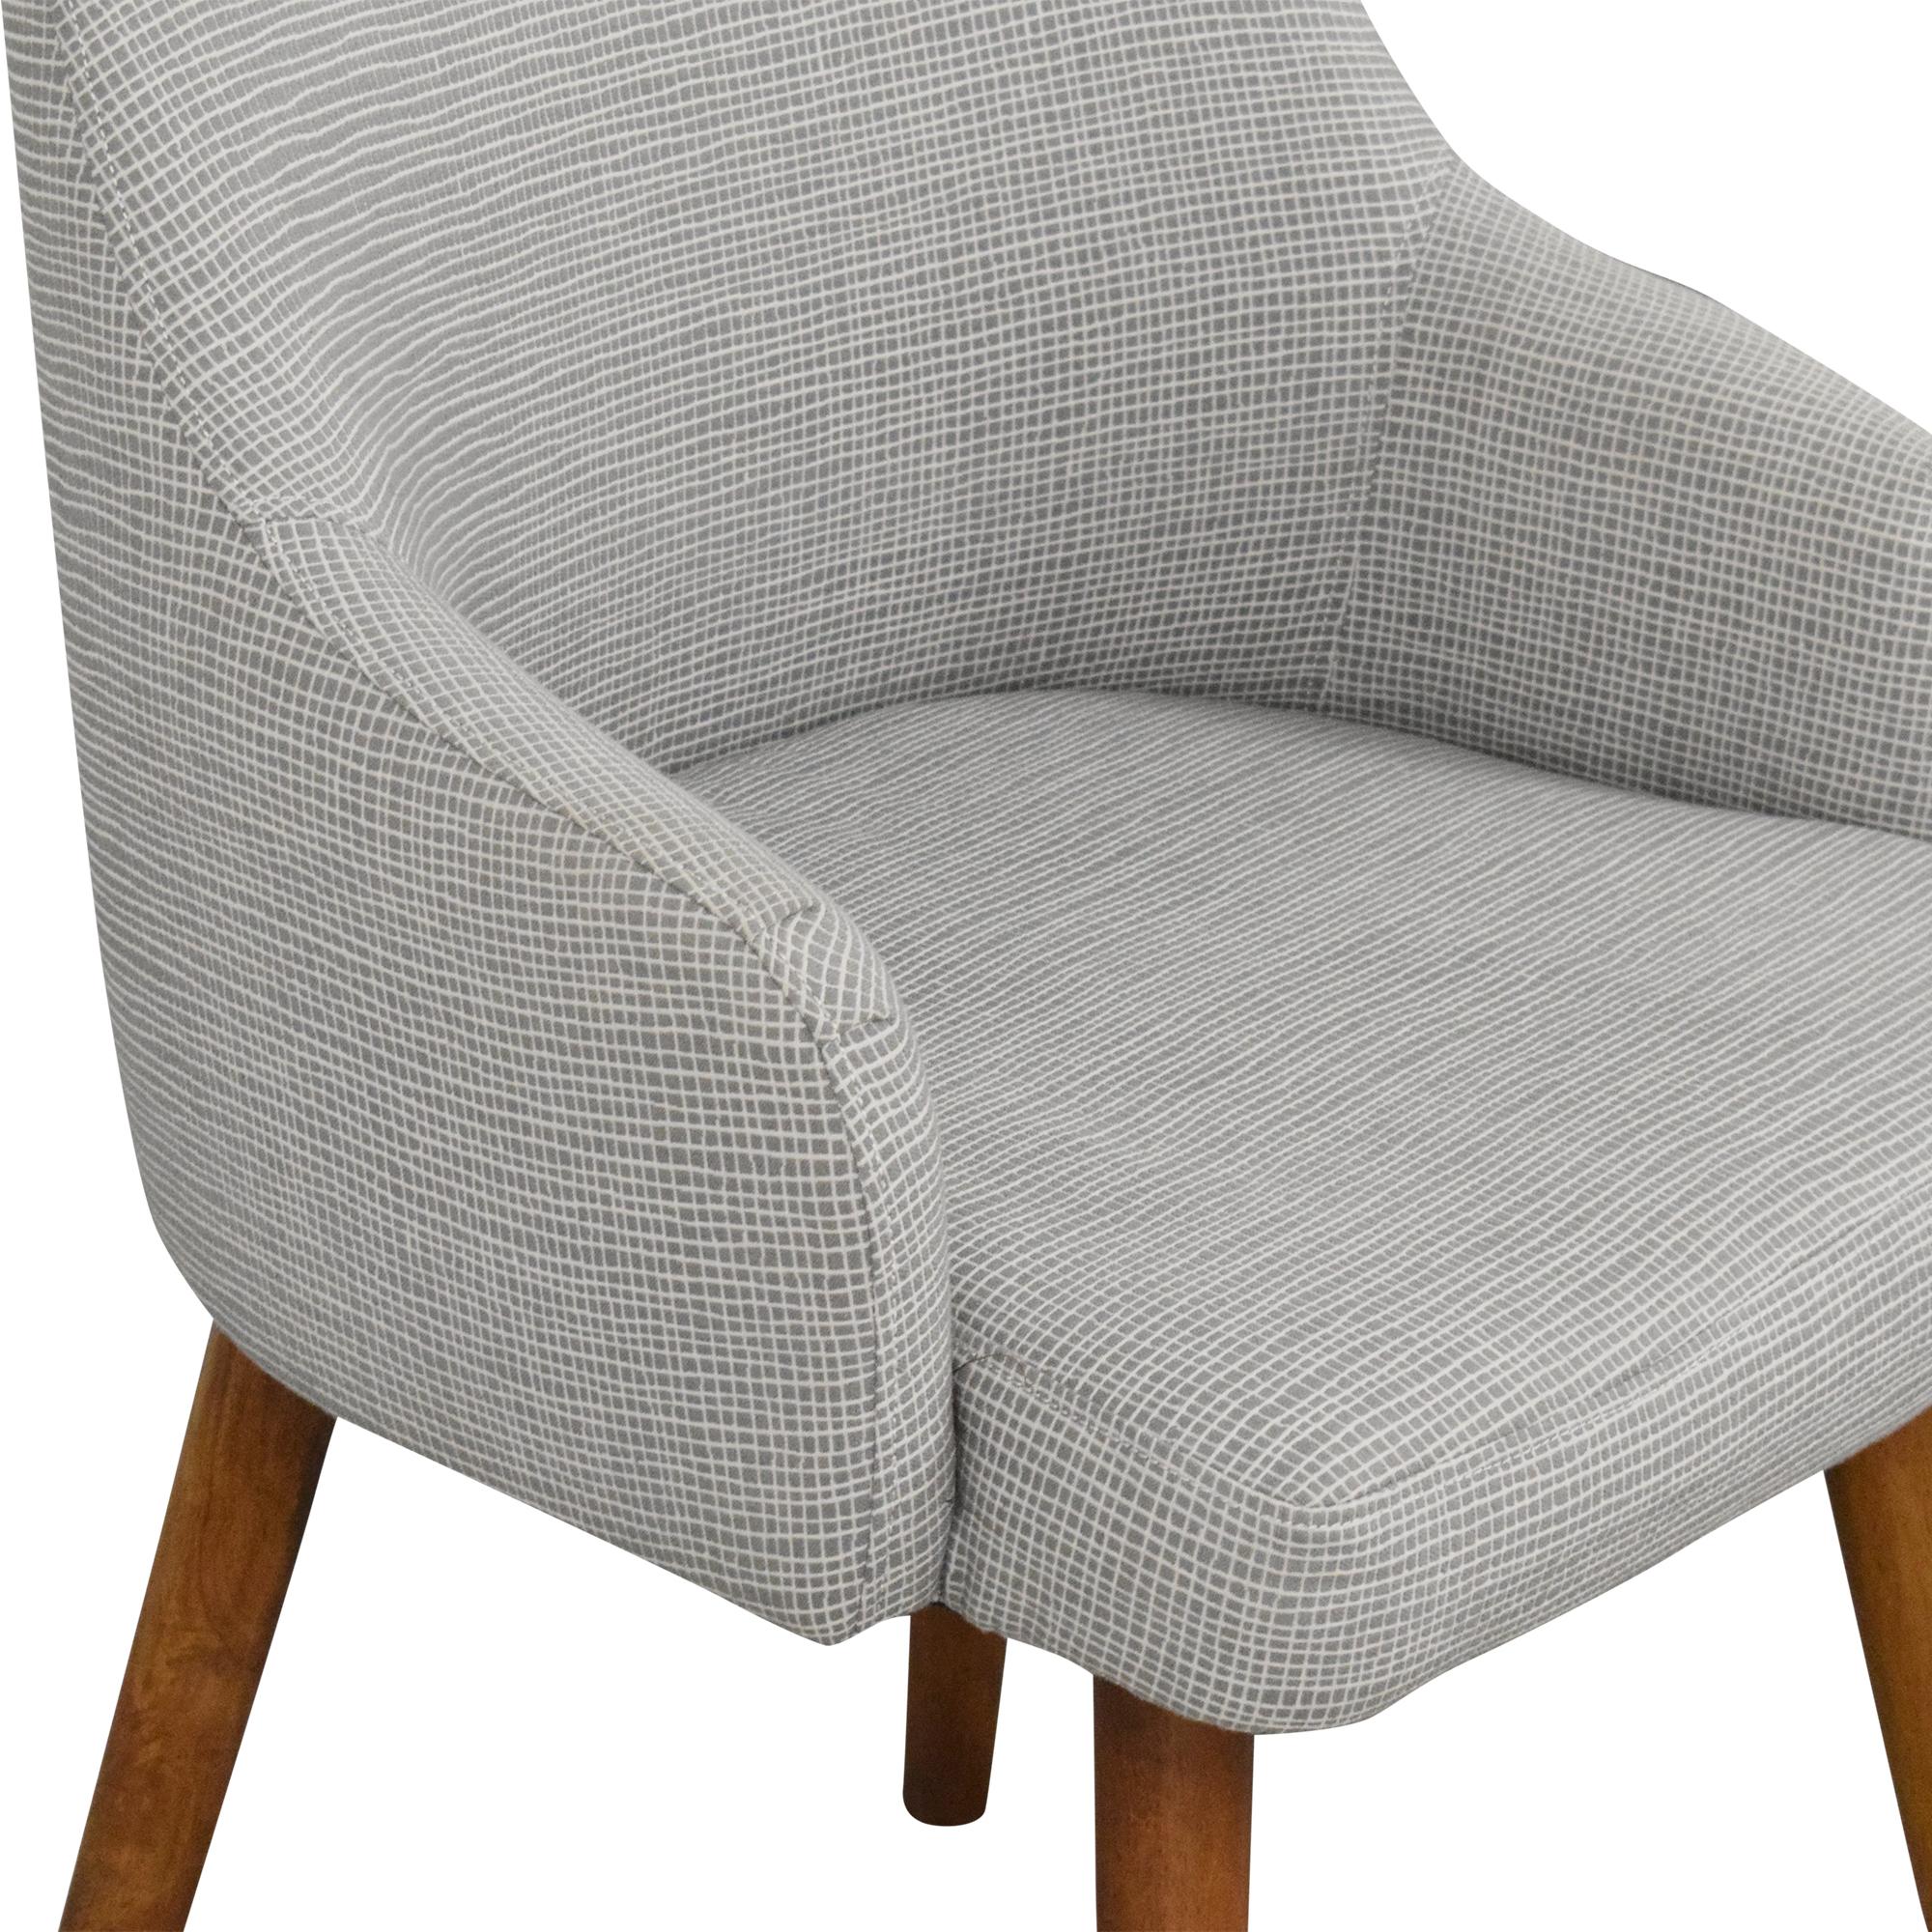 shop West Elm West Elm Saddle Dining Chairs online